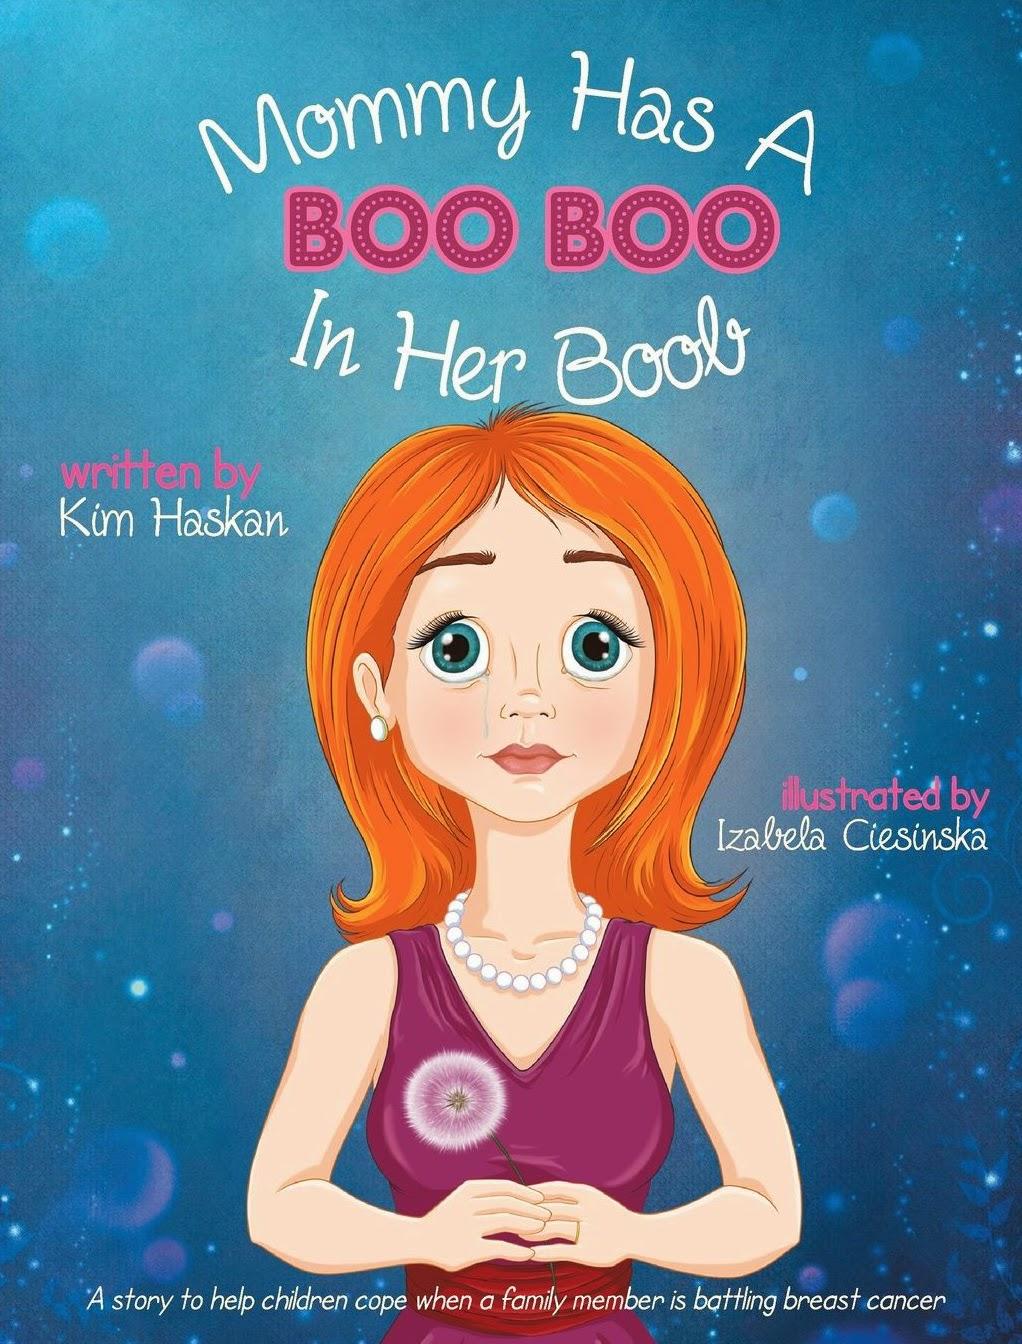 http://kimhaskan.com/KimHaskan/My_Book.html